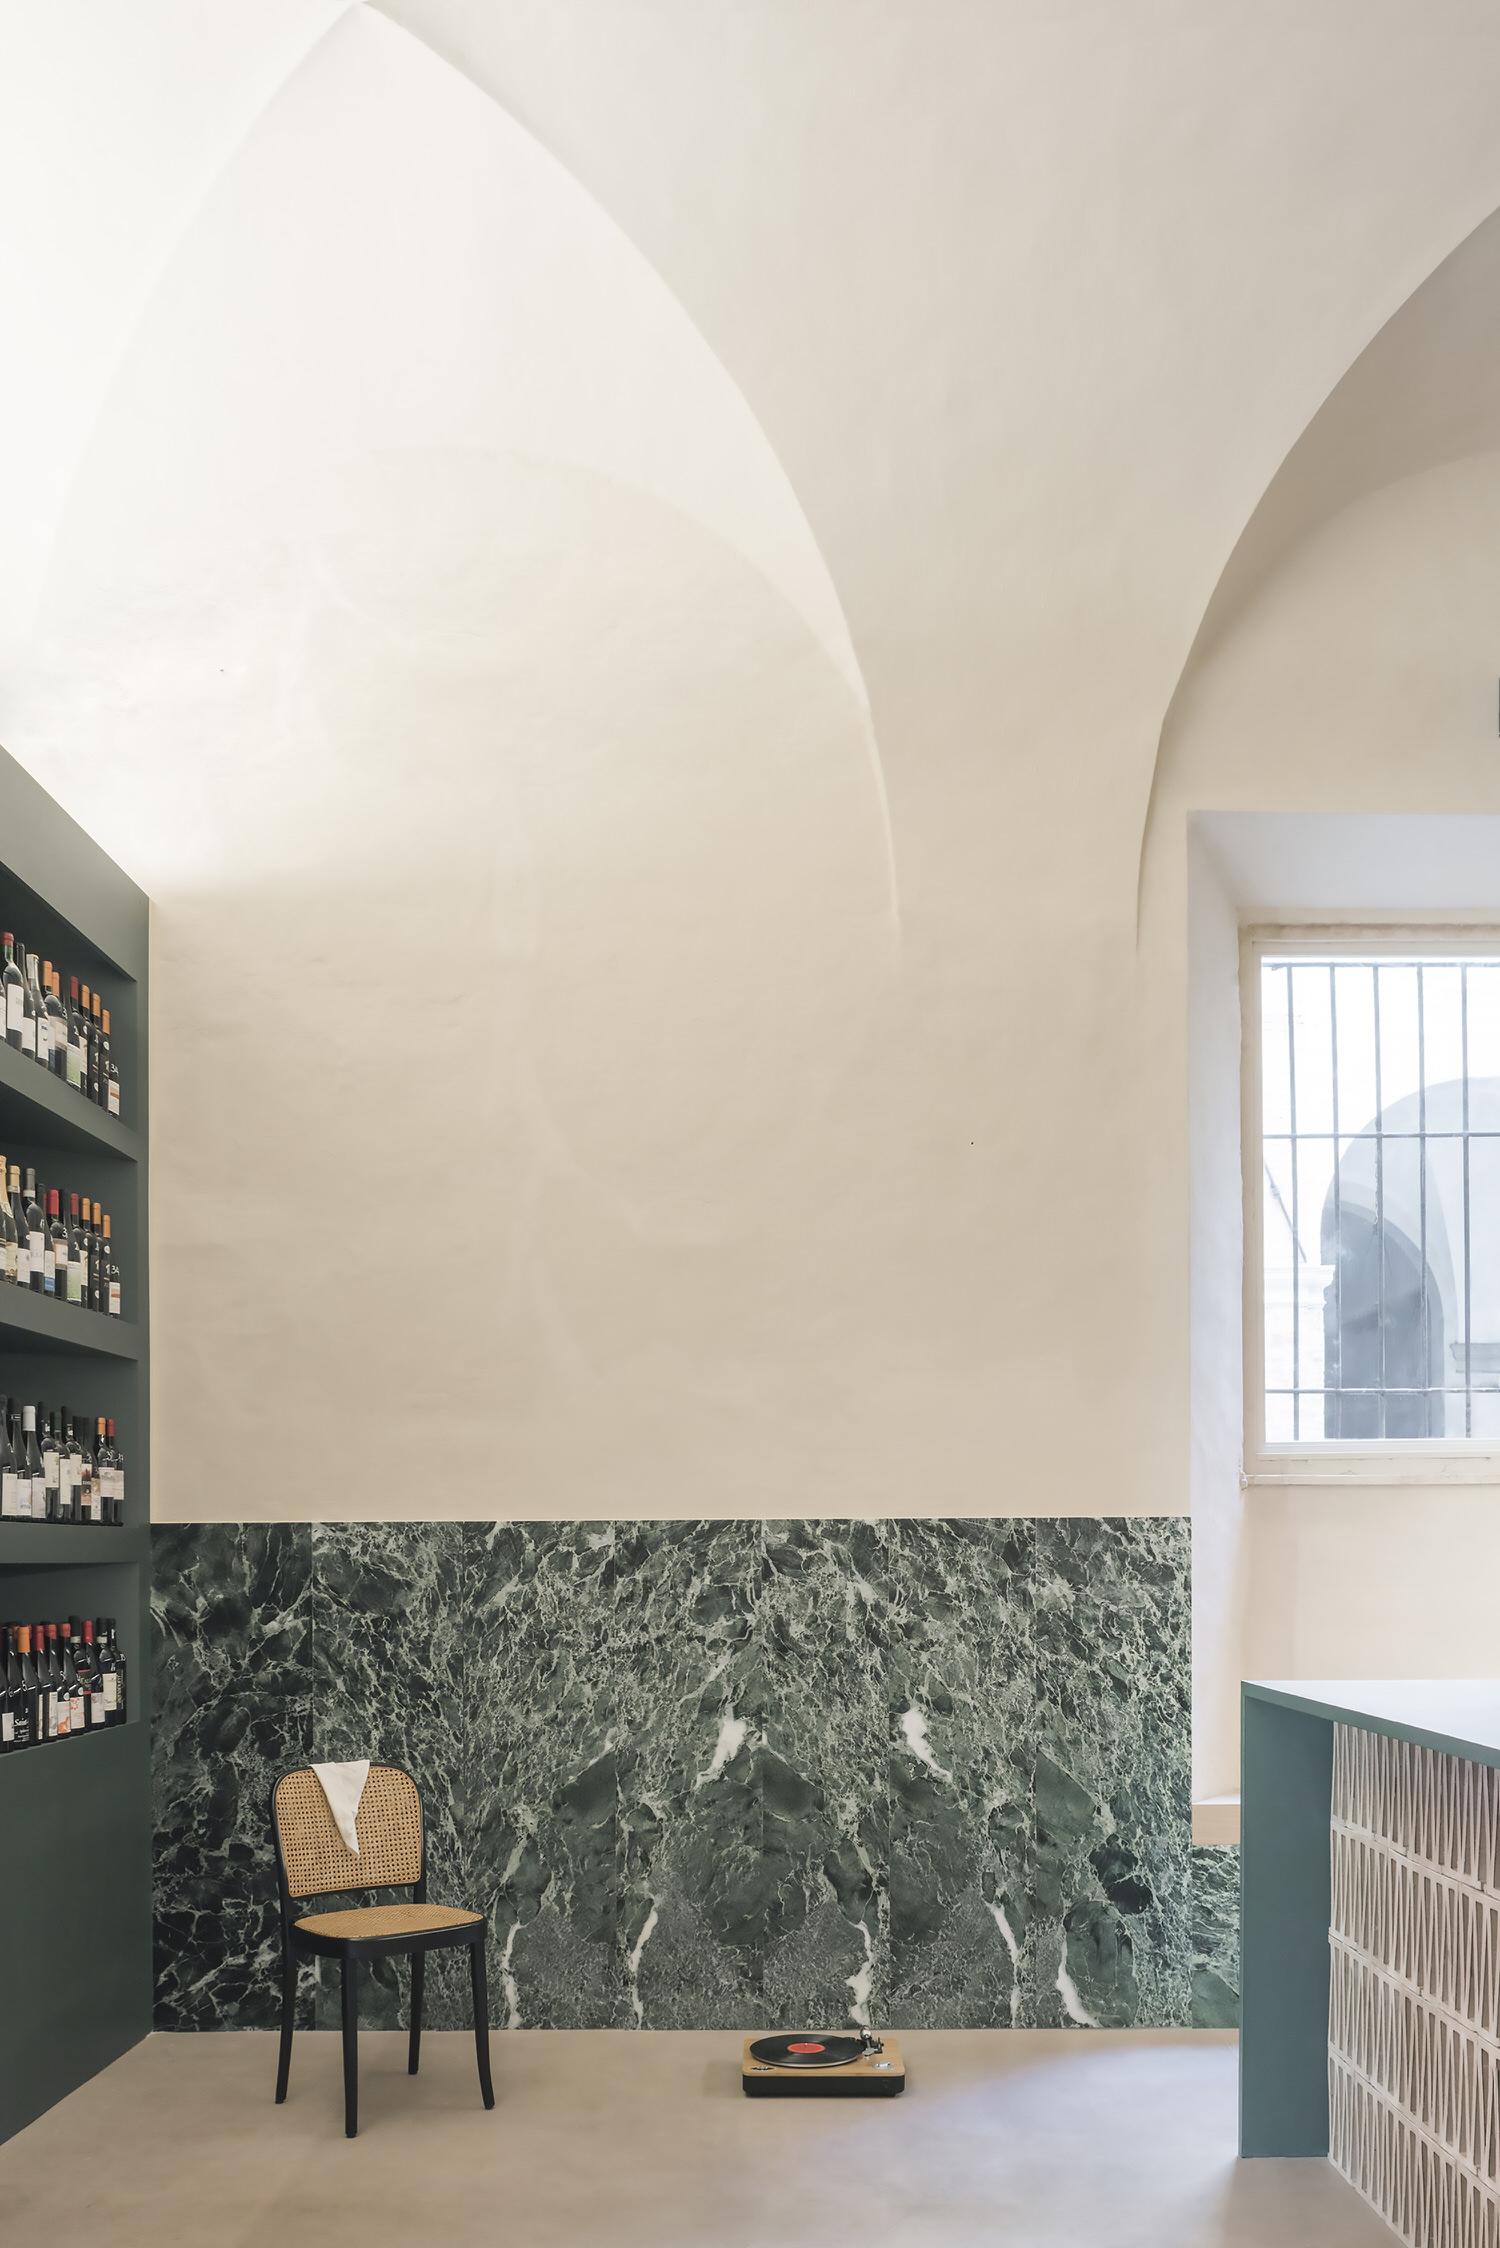 Brunelli Ann Minciacchi, Fano Winery, 16th Century Italian Palazzo, Photo Lorenzo Zandri | Yellowtrace